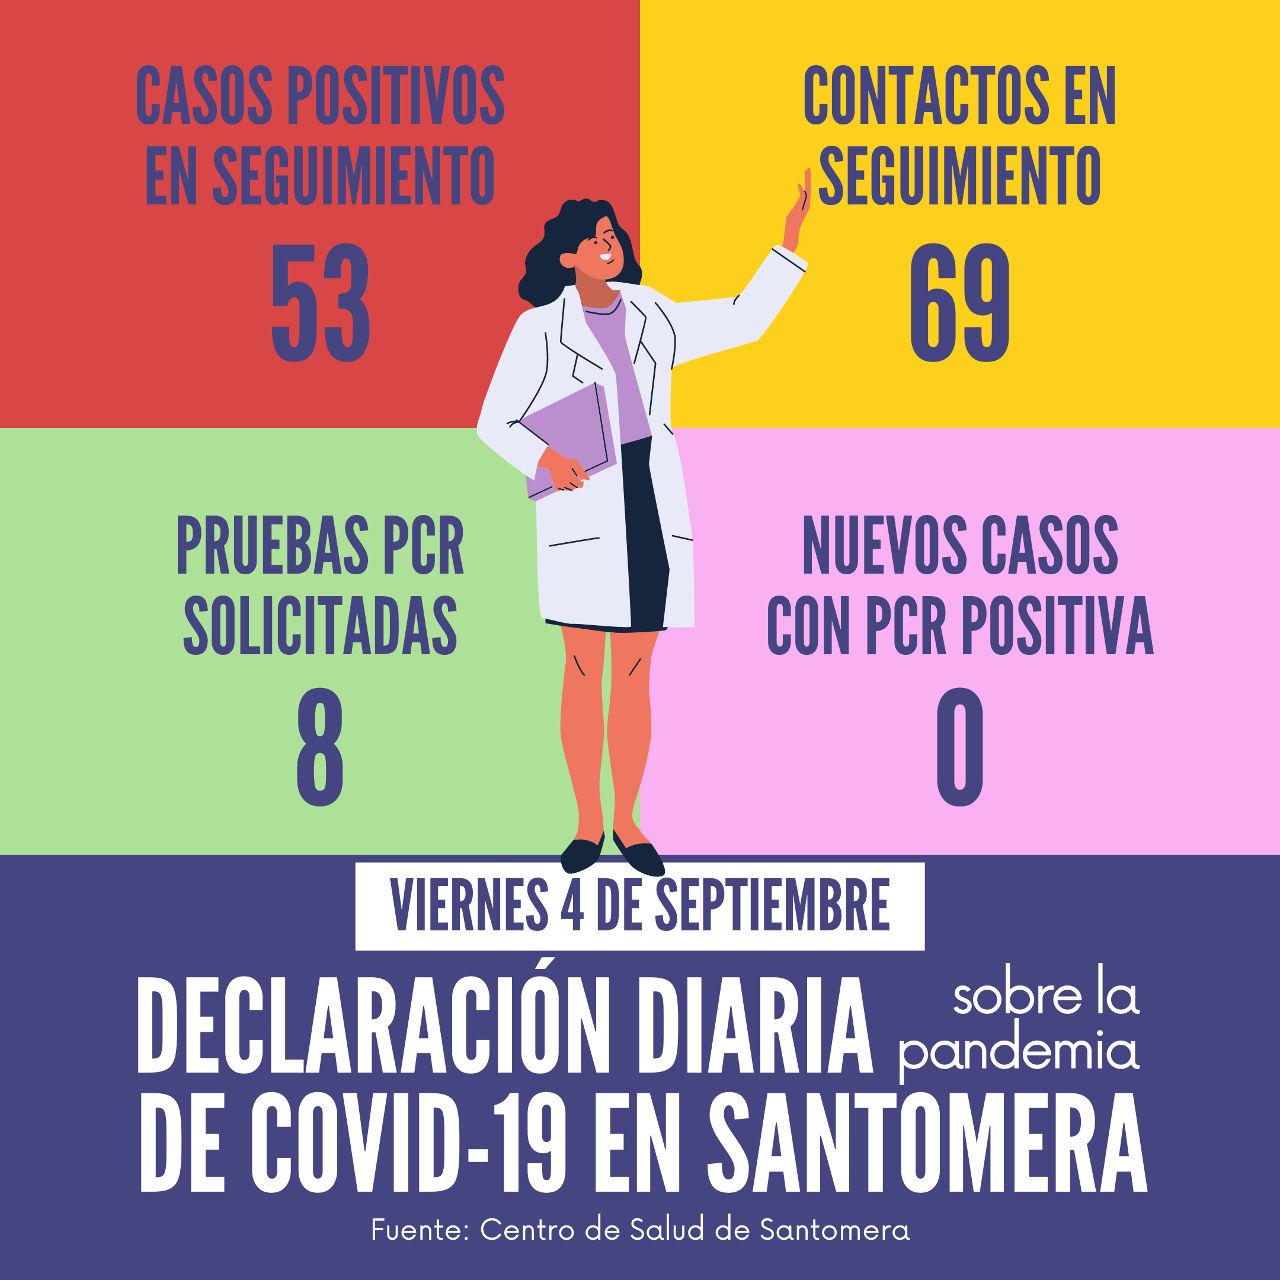 20200904_Datos COVID-19 Santomera